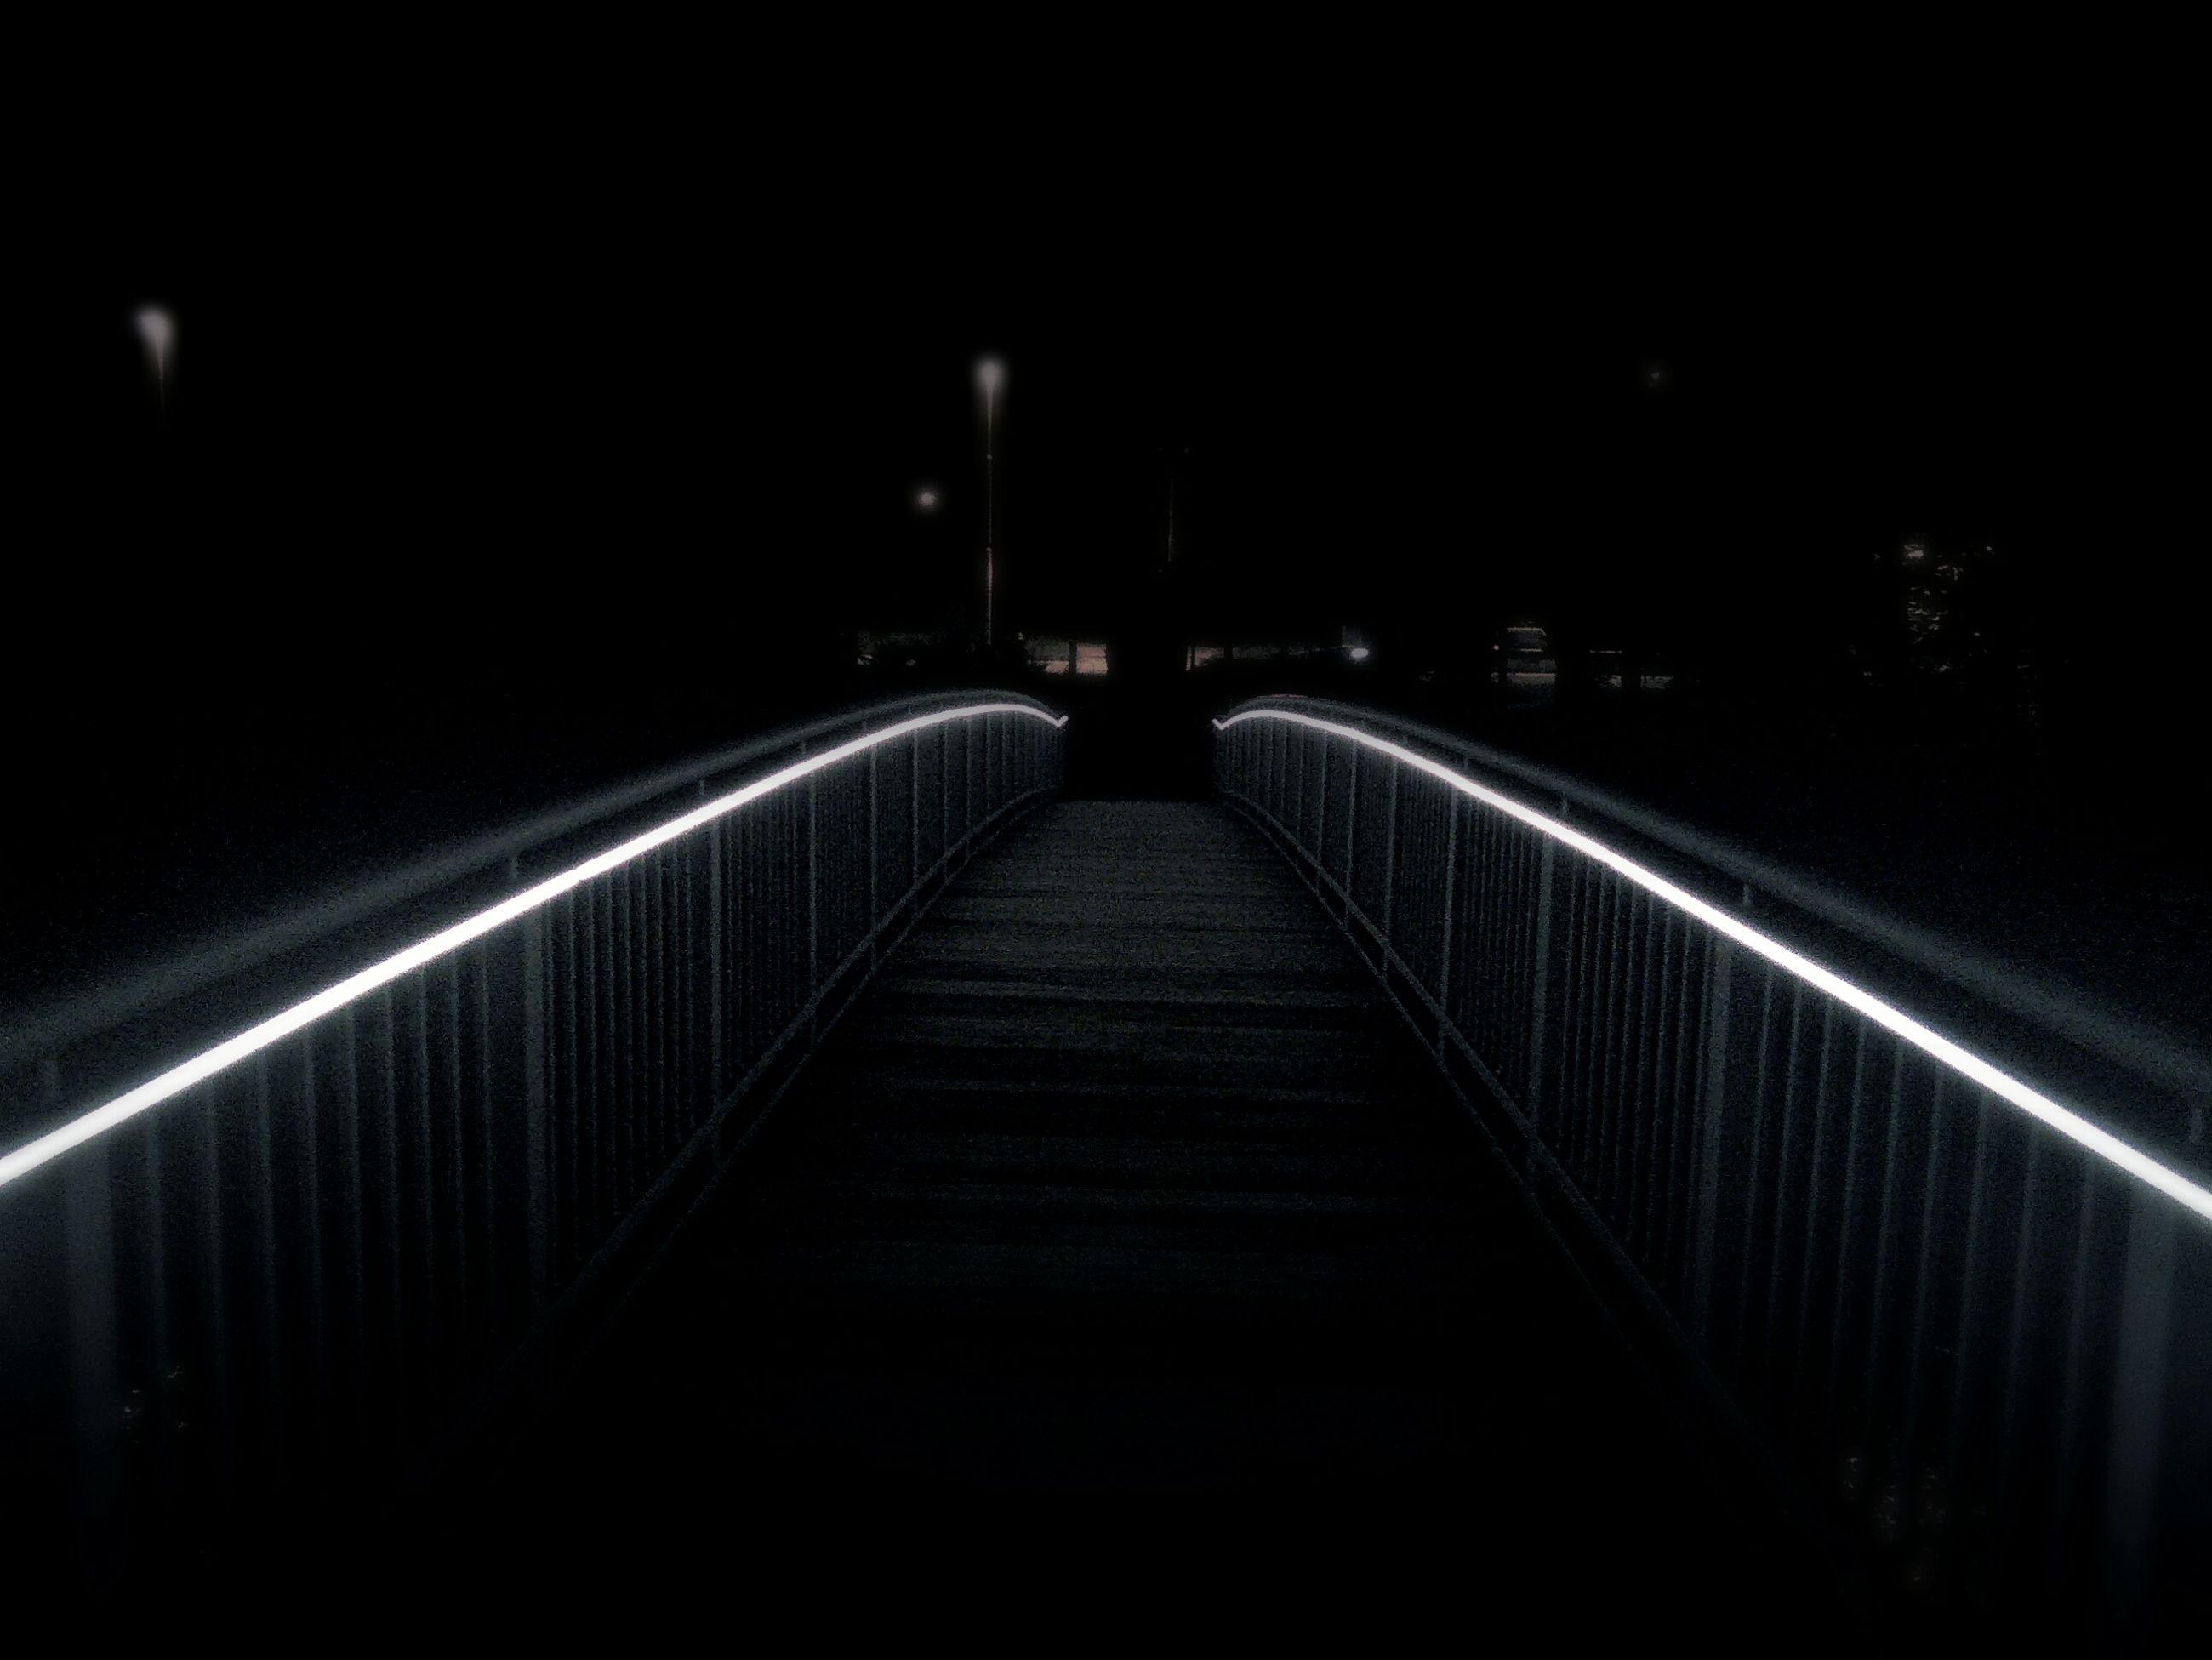 the way forward, night, railing, illuminated, connection, bridge - man made structure, diminishing perspective, footbridge, built structure, vanishing point, architecture, long, bridge, transportation, dark, narrow, walkway, outdoors, no people, street light